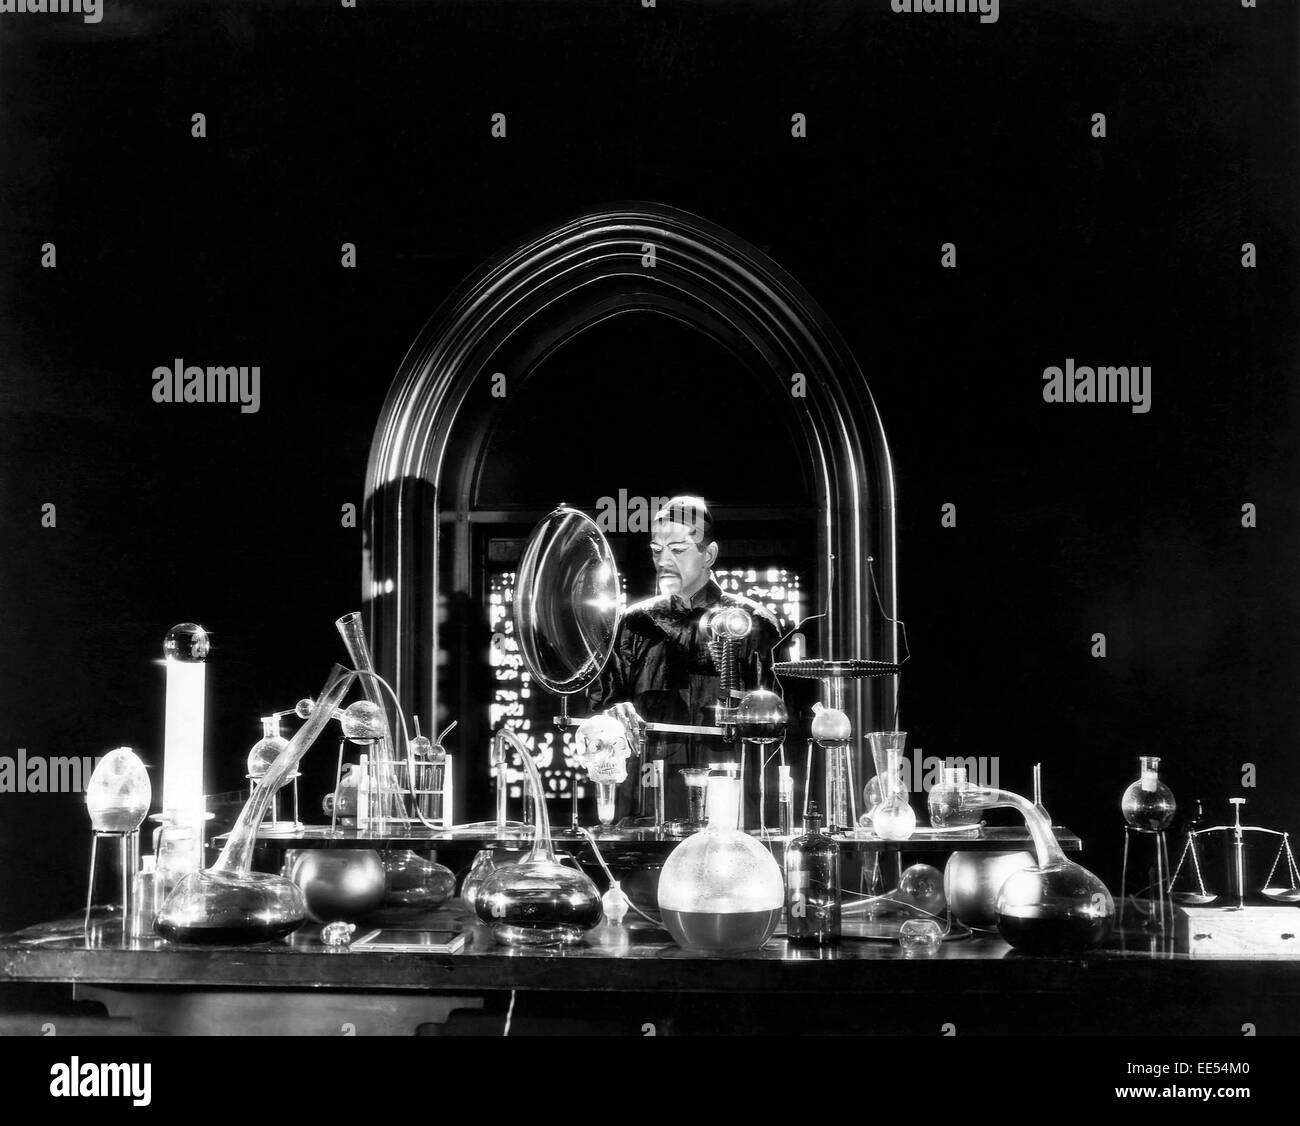 Boris Karloff, on-set of the Film, 'The Mask of Fu Manchu', 1932 - Stock Image